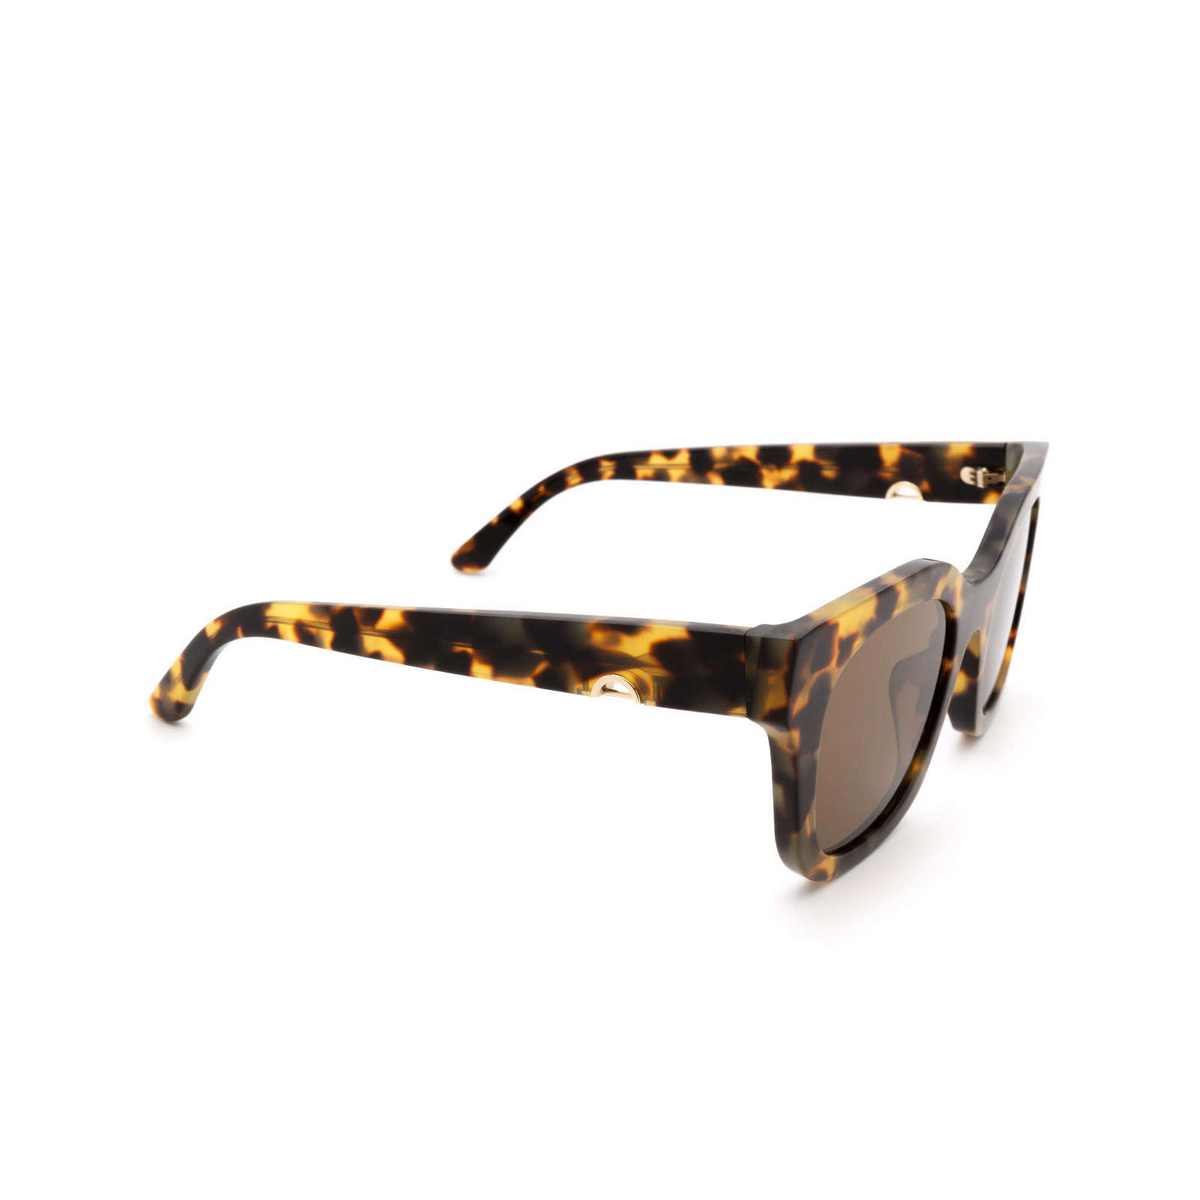 Huma® Square Sunglasses: Blue color Havana Leo 19 - three-quarters view.